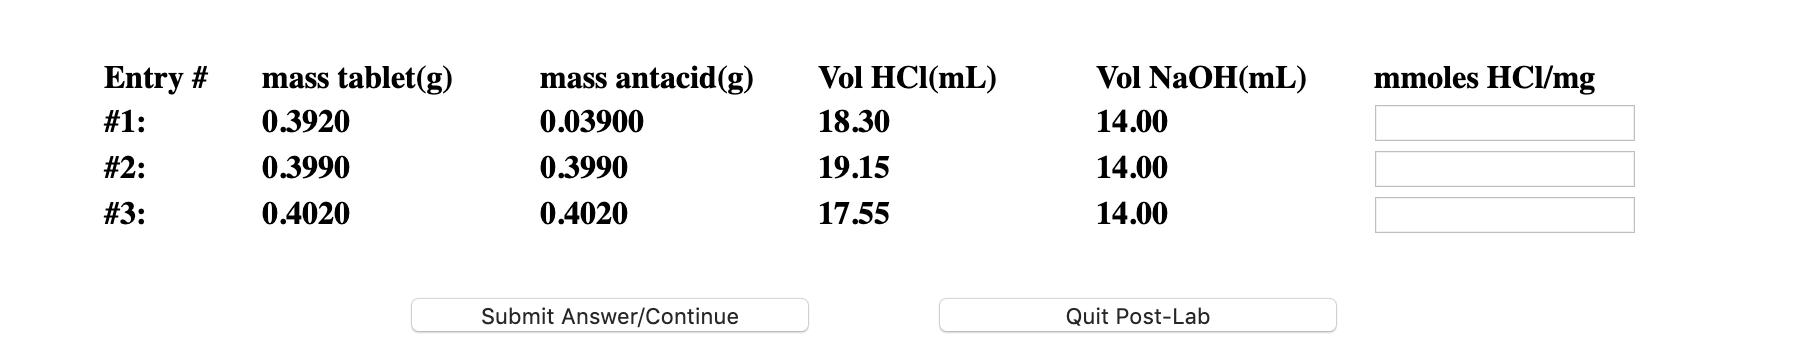 mmoles HCl/mg Entry # #1: #2: #3: mass tablet(g) 0.3920 0.3990 0.4020 mass antacid(g) 0.03900 0.3990 0.4020 Vol HCl(mL) 18.30